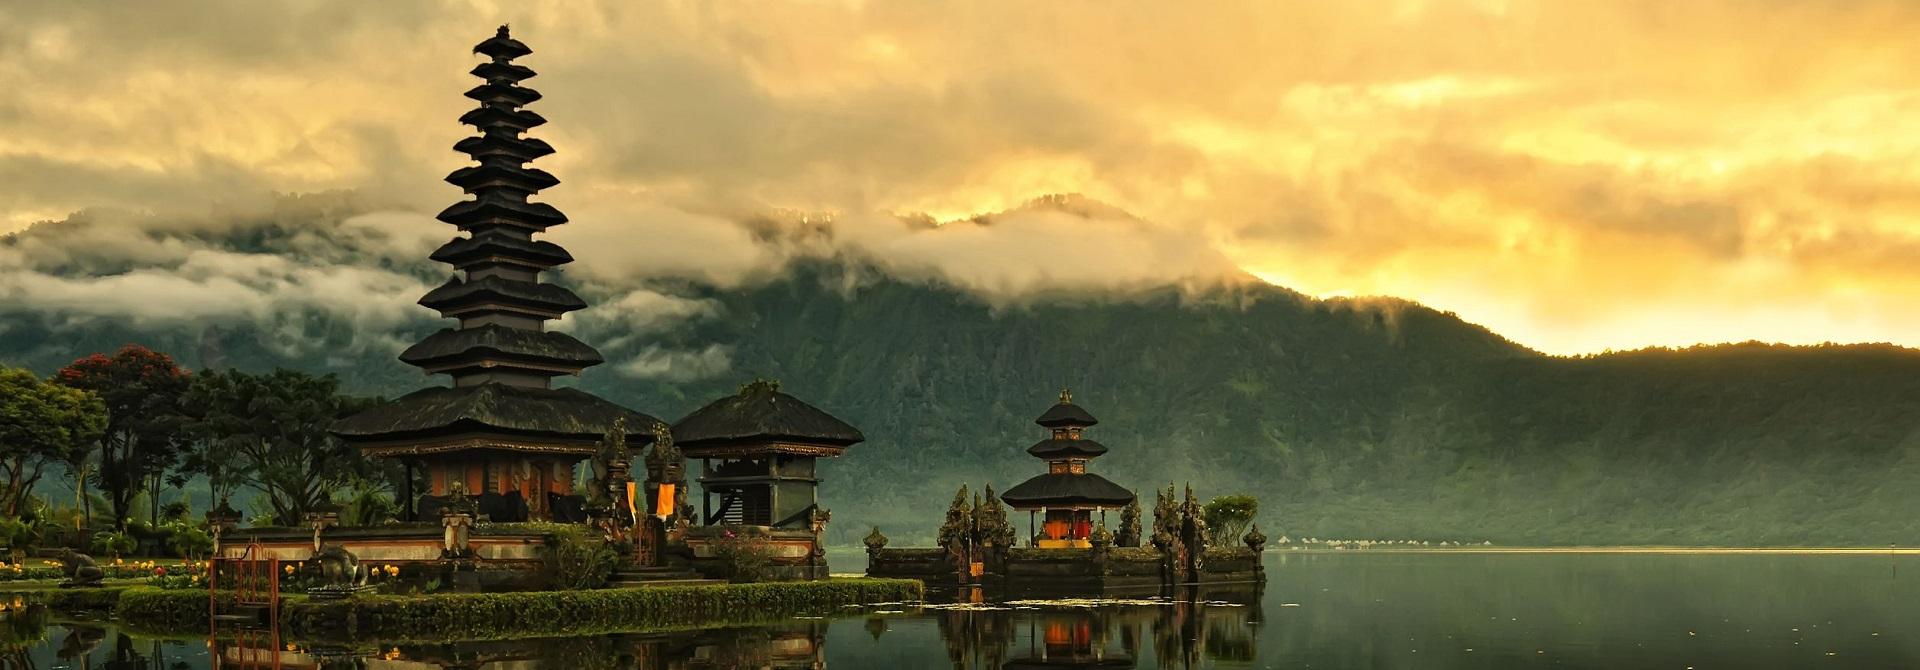 Mau Liburan ke Bali Cek Paket Tour Bali 2020 Terbaru